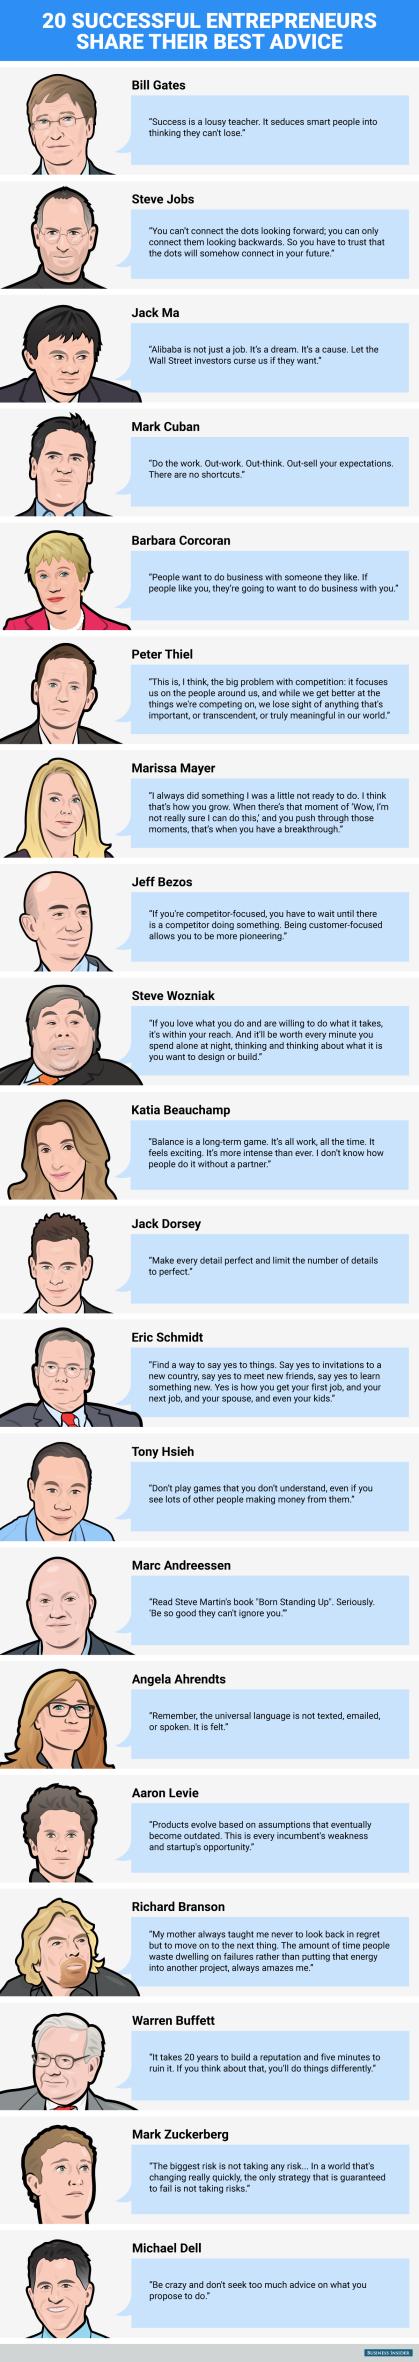 151209-influential-entrepreneuers-advice-BI-infographic1